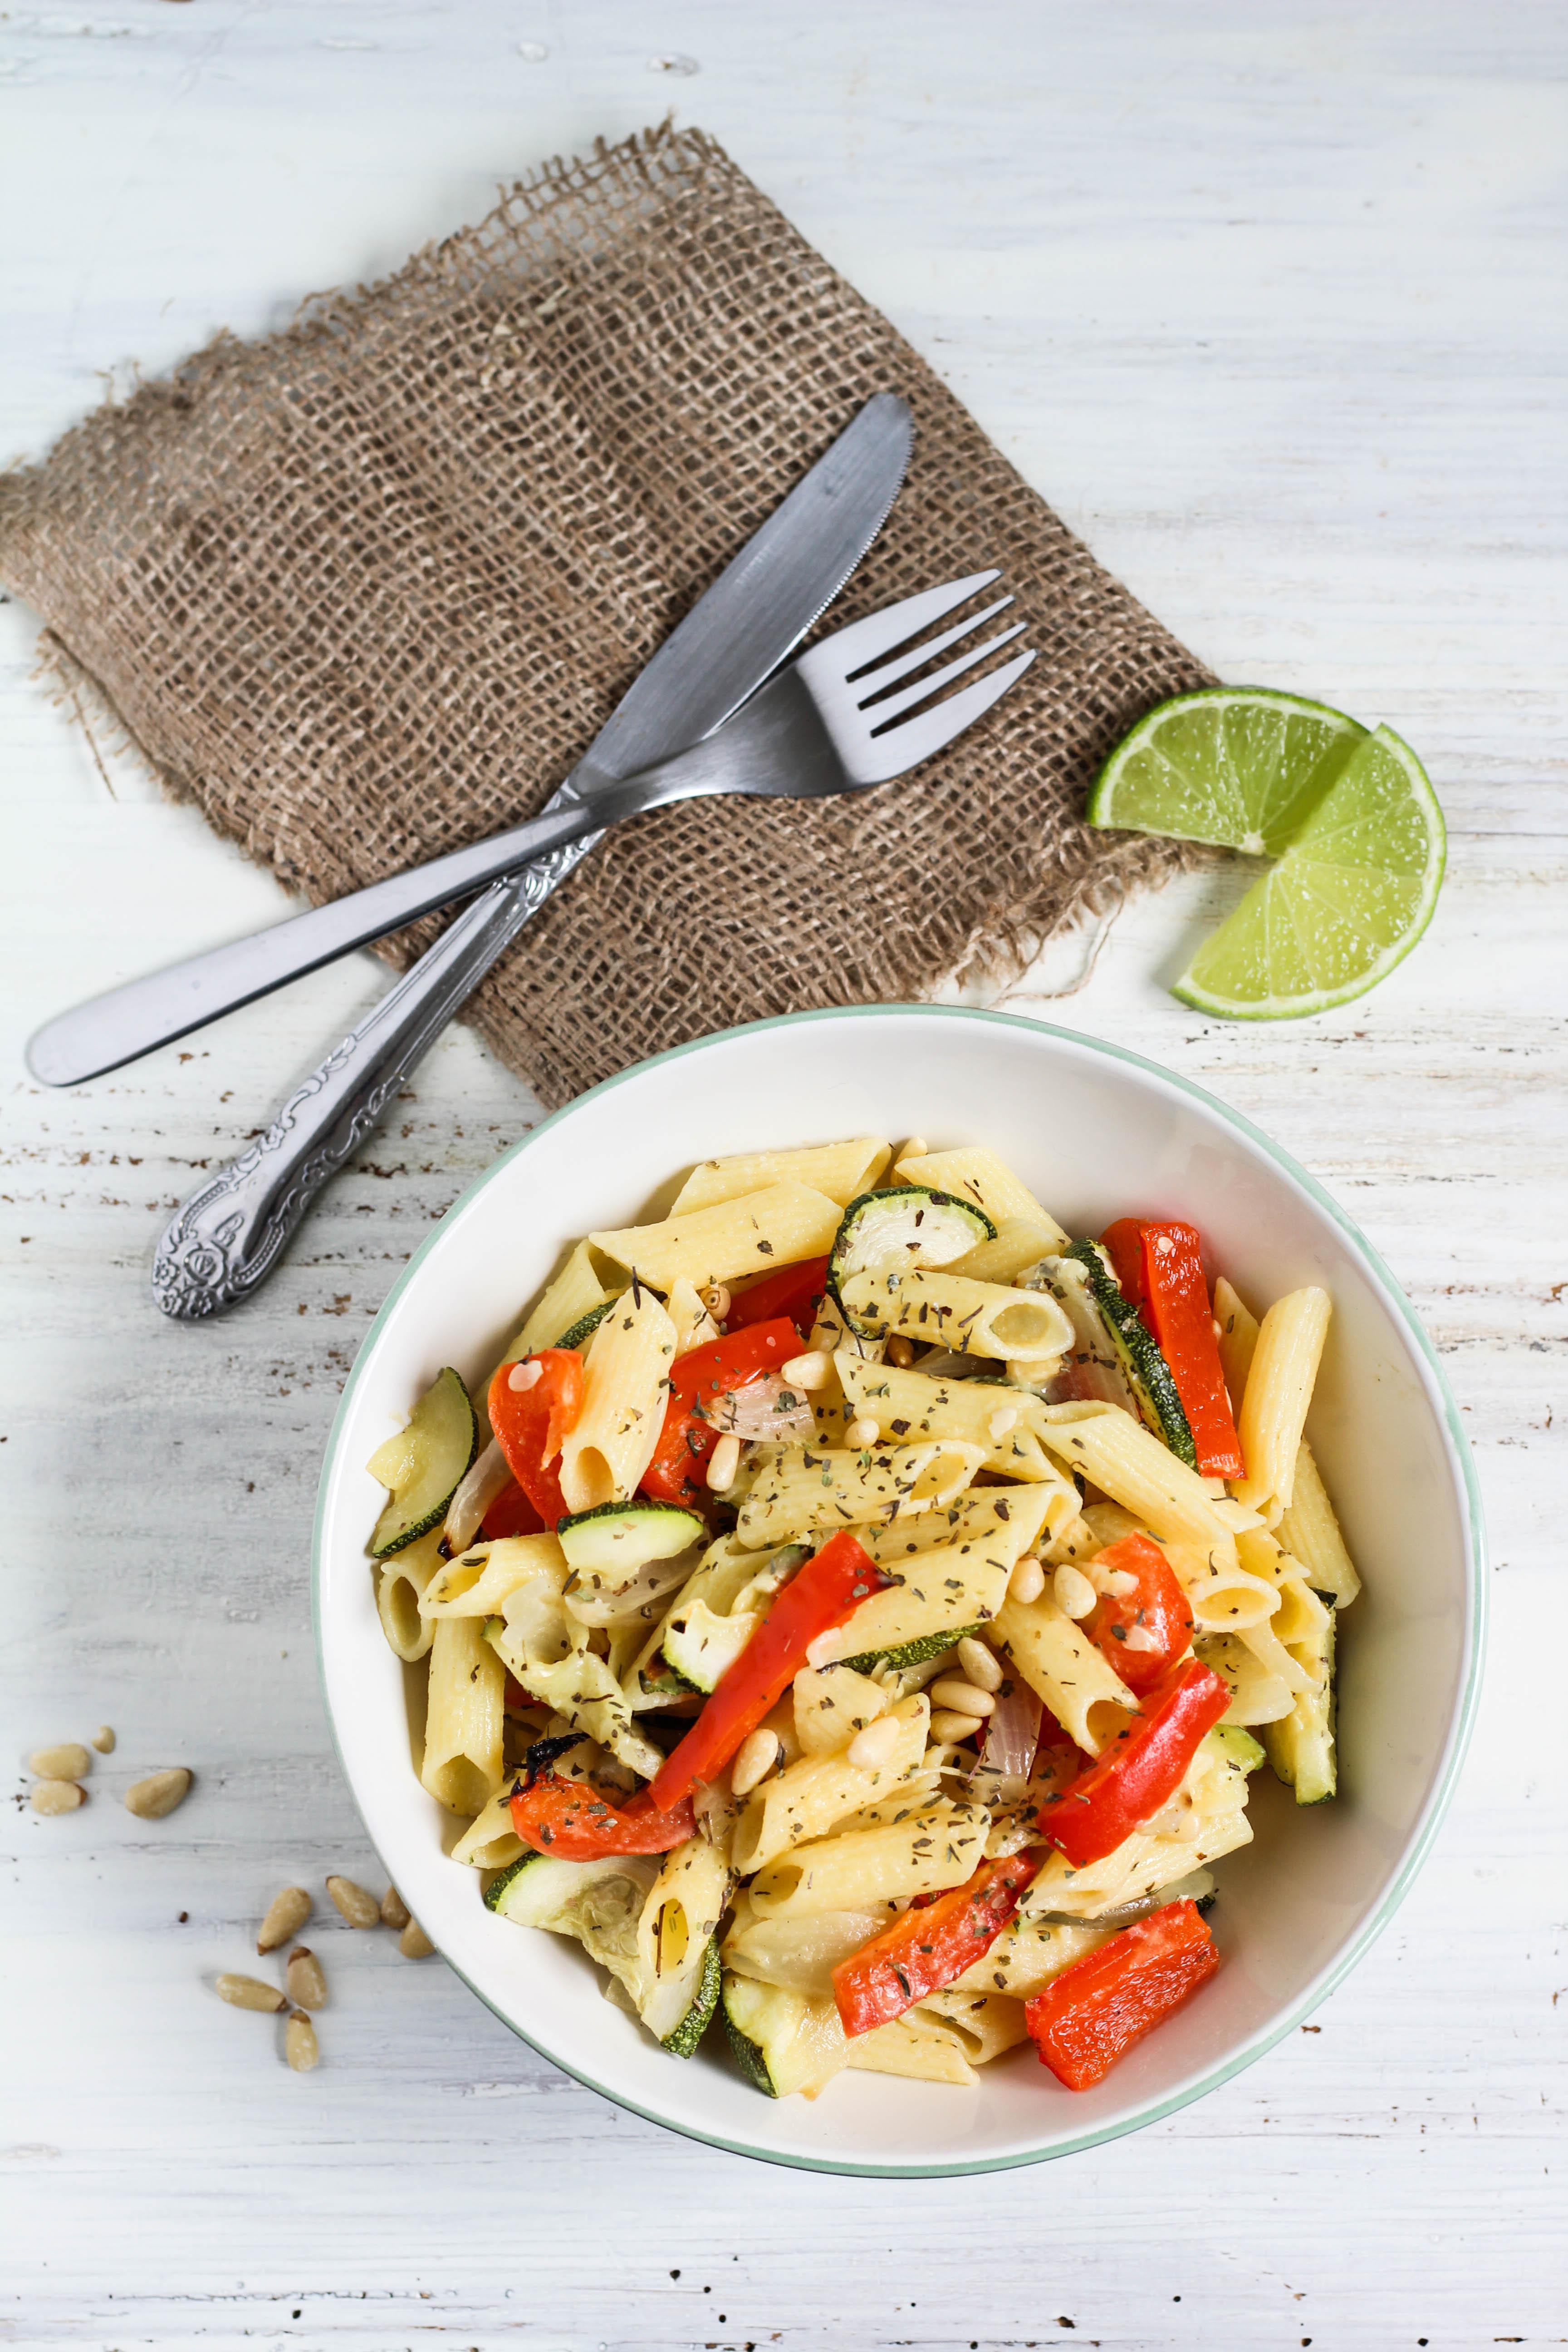 mediterranean-pasta-salad-with-oven-roasted-vegetables-vegan-gluten-free